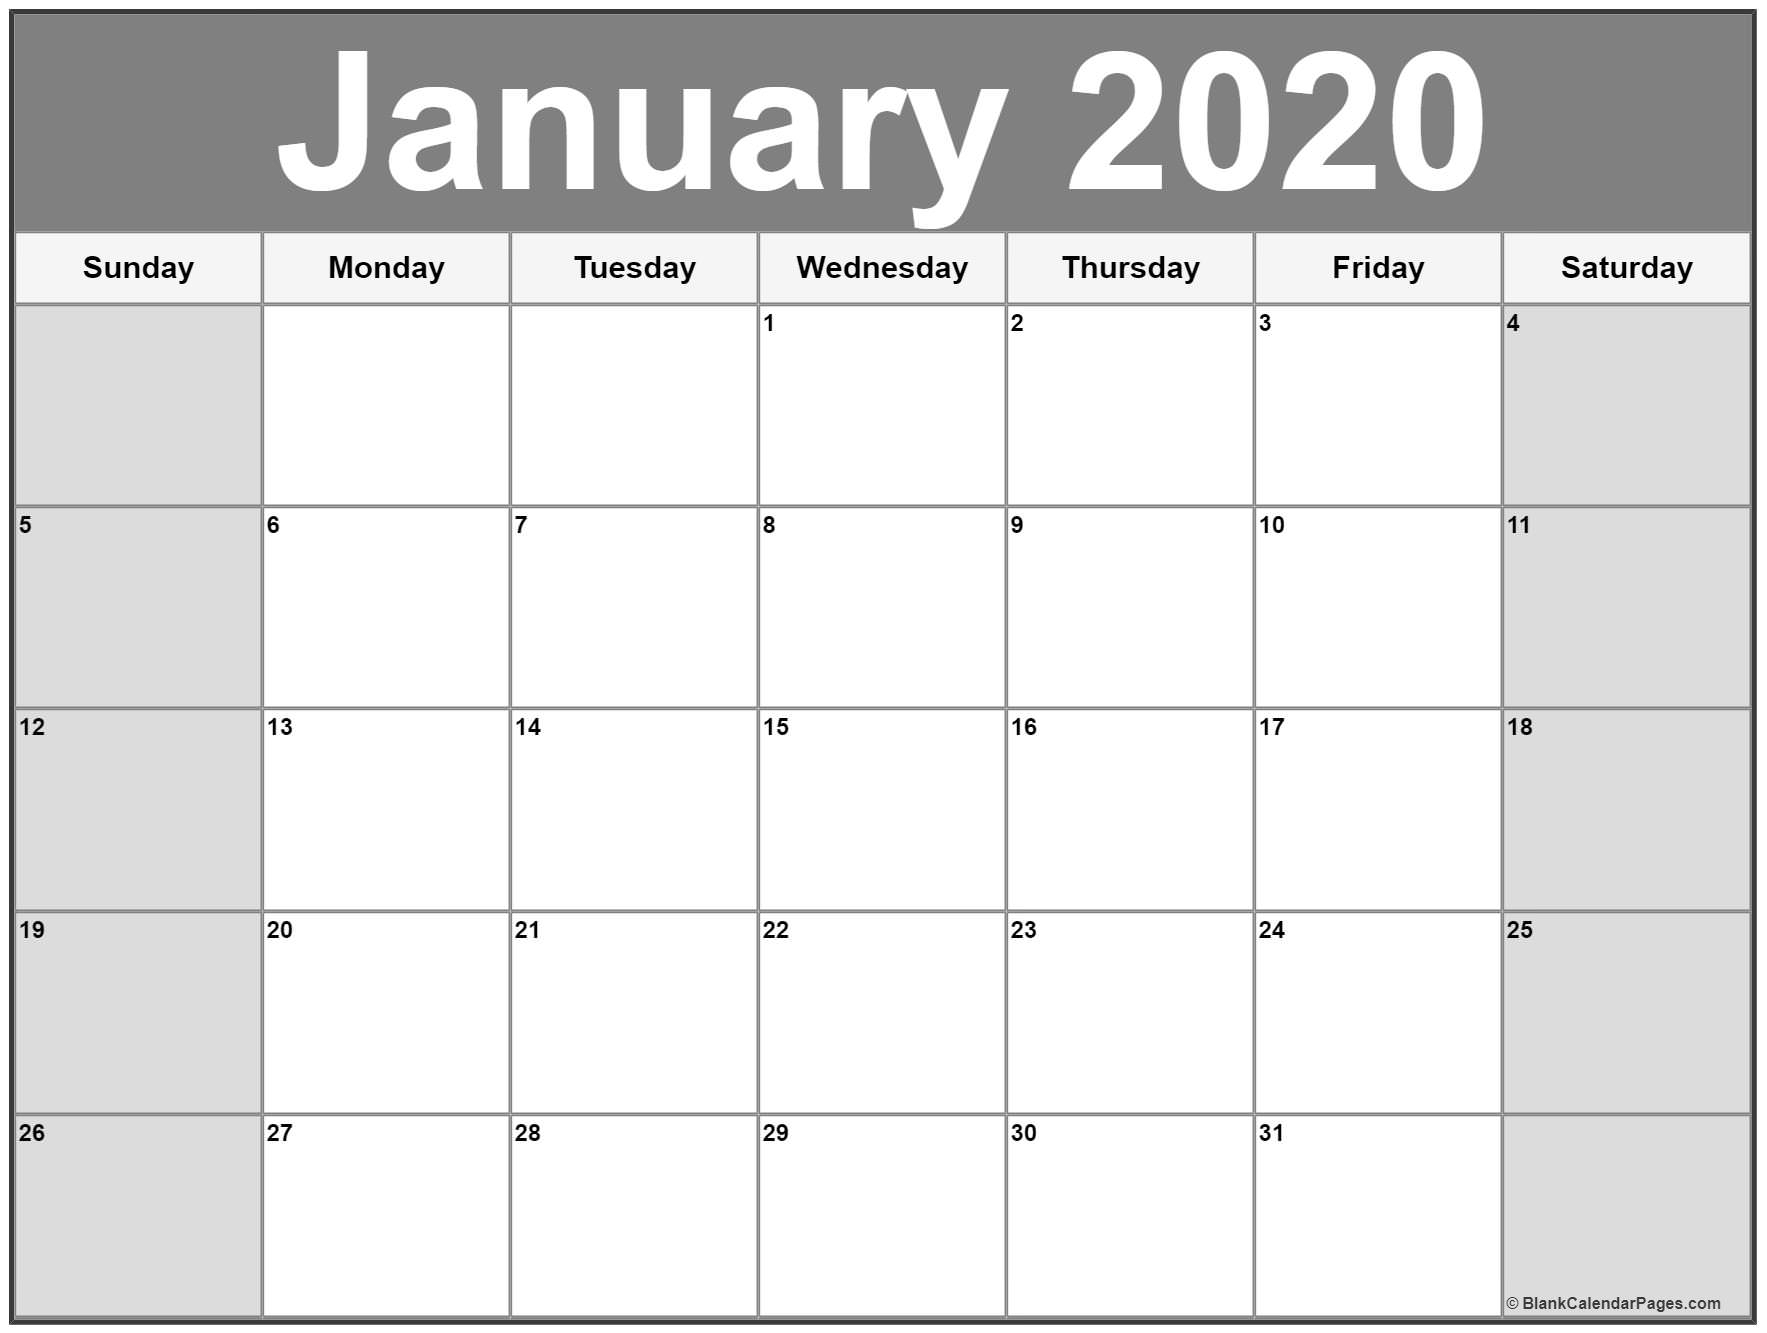 January 2020 Calendar | Free Printable Monthly Calendars with regard to 2020 Imom Calendar Printable